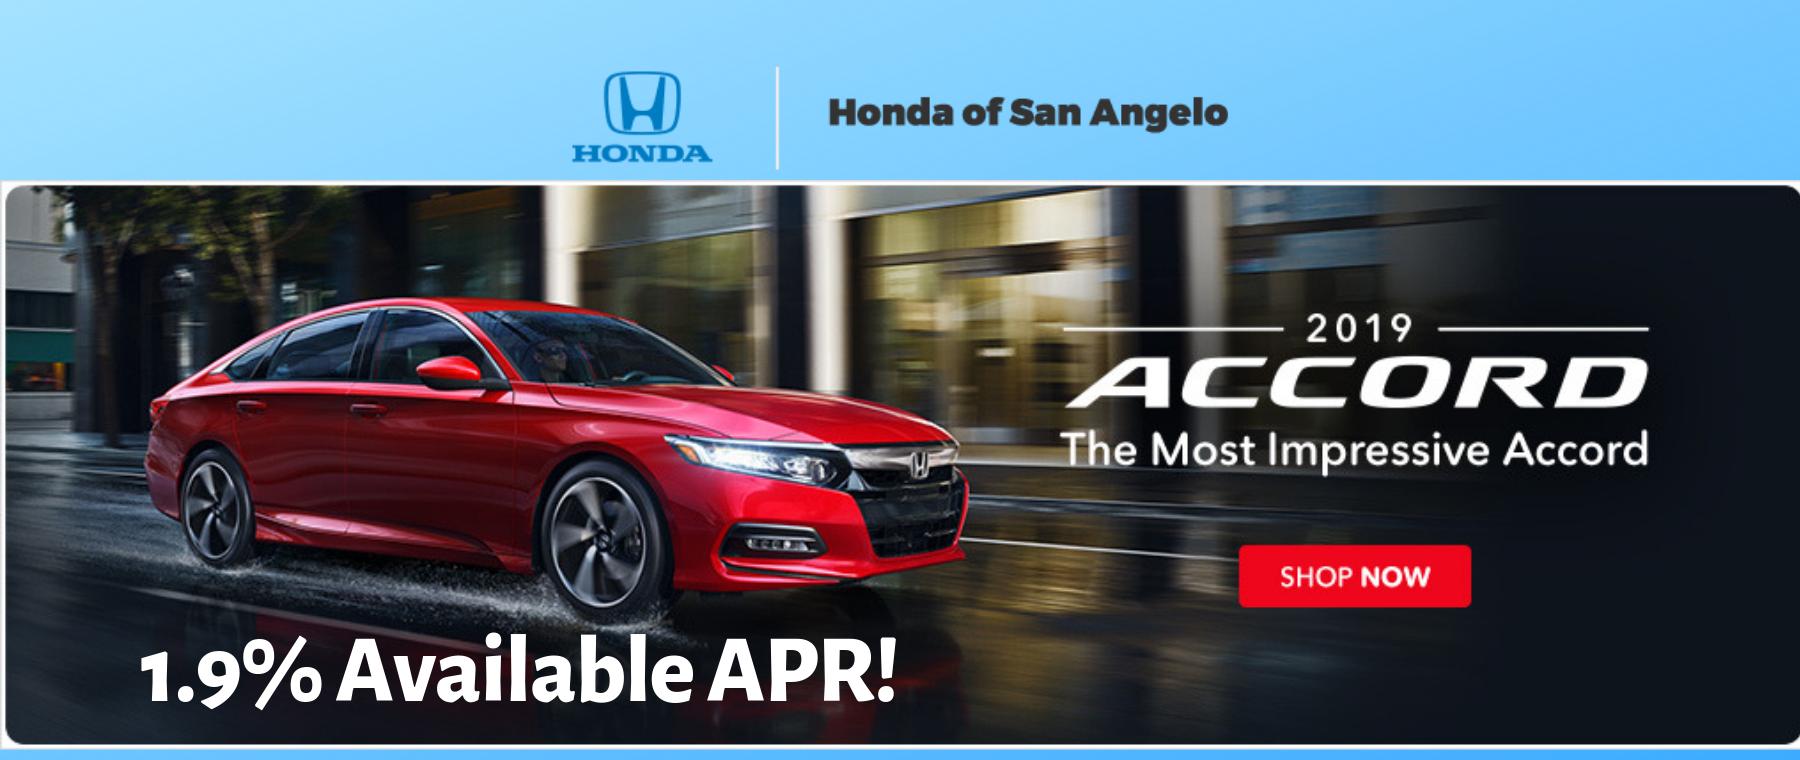 2019 Honda Accord 1.9% APR